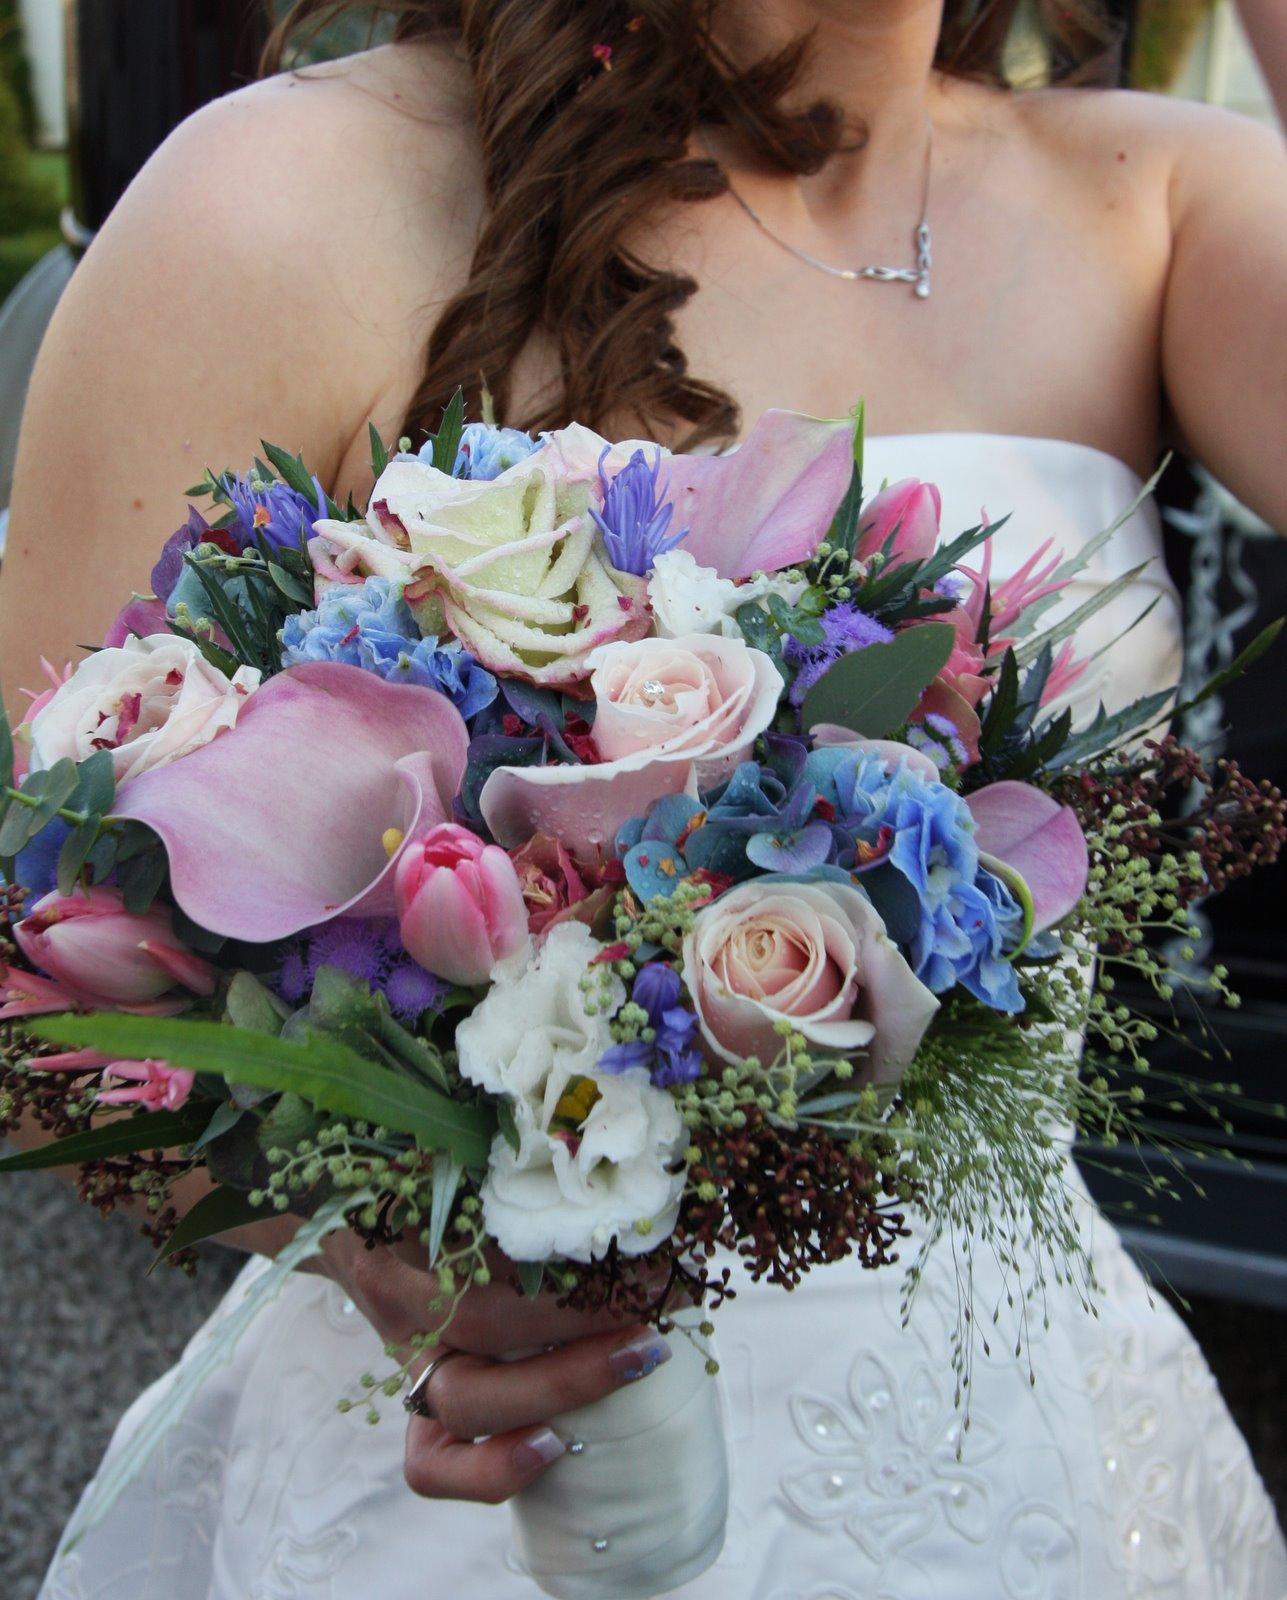 Blue white wedding flowers choice image flower decoration ideas de beautiful wedding bouquet blue wedding dress collection mightylinksfo izmirmasajfo